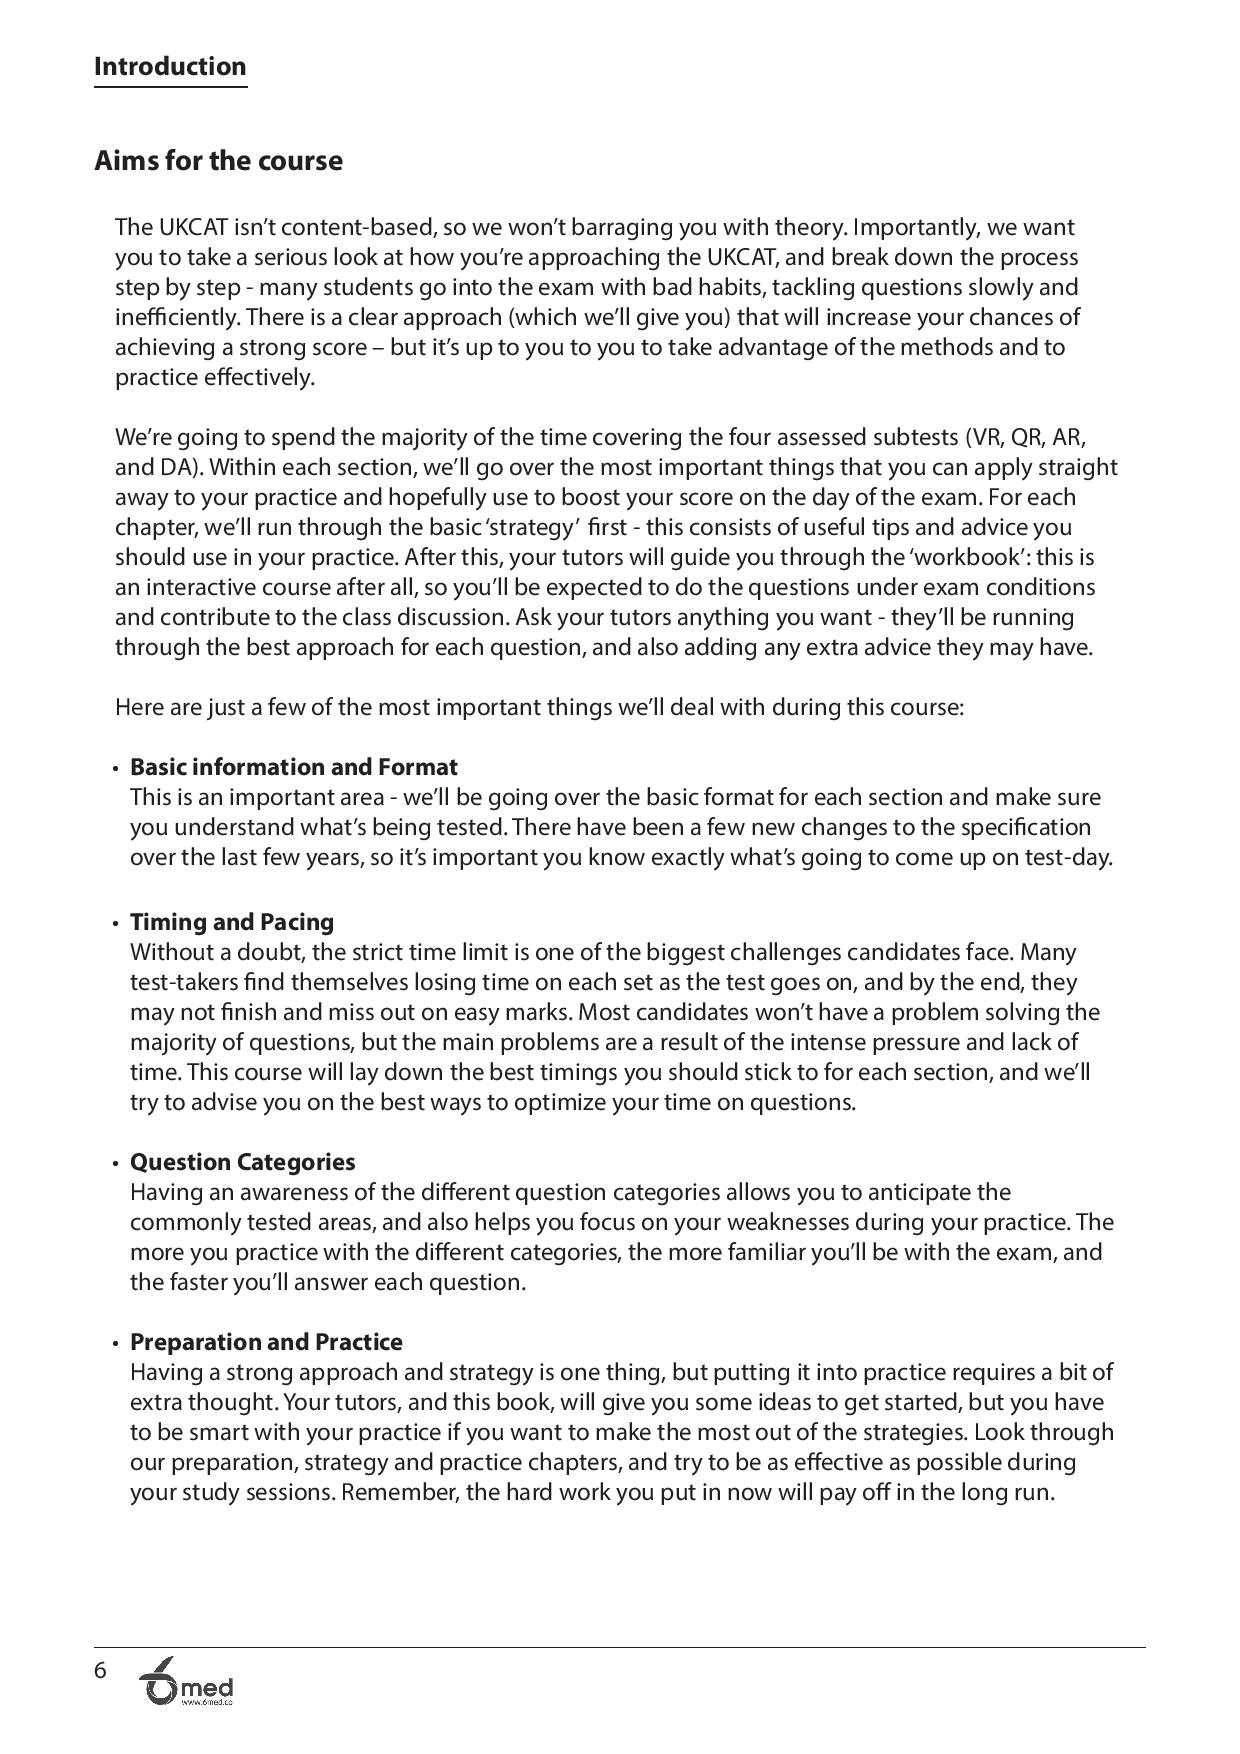 UKCAT Crash Course Handbook page 5